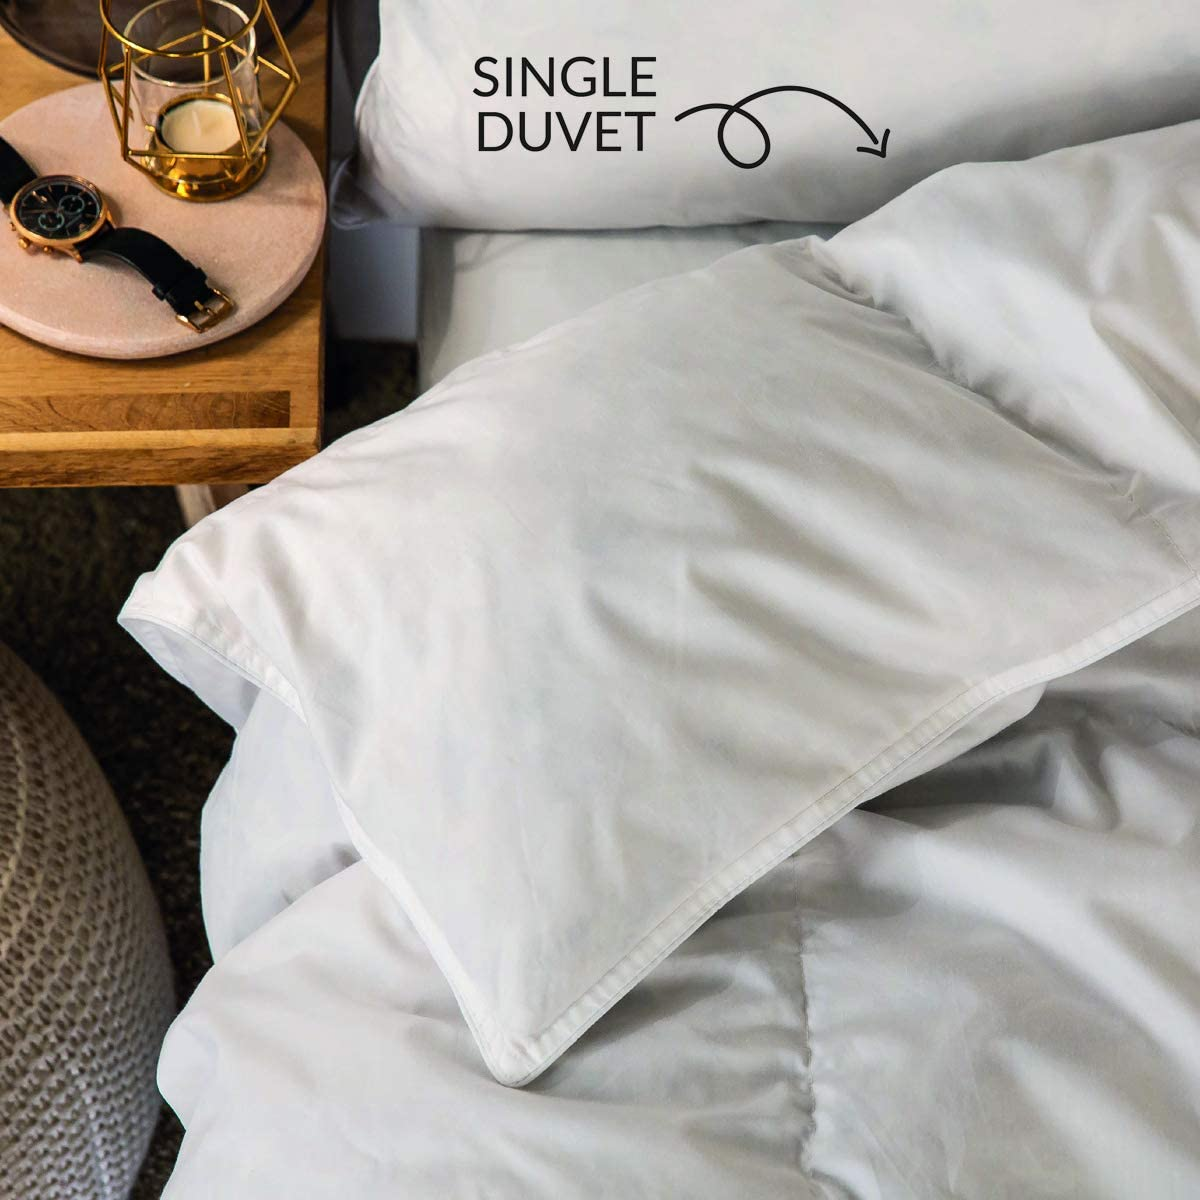 Snuggledown Bettdecke G/änsefedern und Daunen 10,5/Tog wei/ß Baumwolle Single